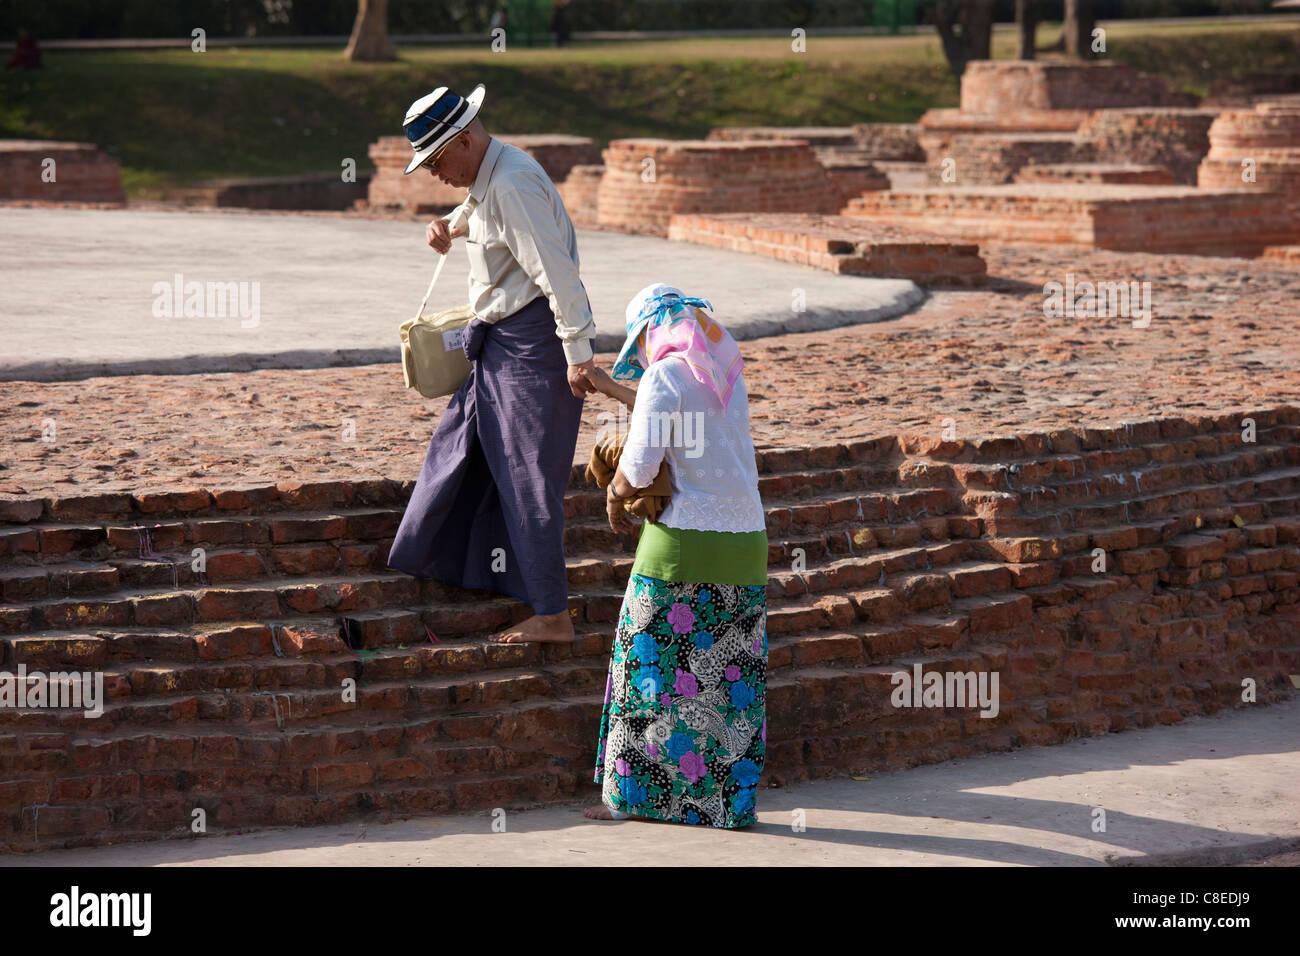 Japanese tourist couple at Dharmarajika Stupa at Sarnath ruins near Varanasi, Benares, Northern India - Stock Image